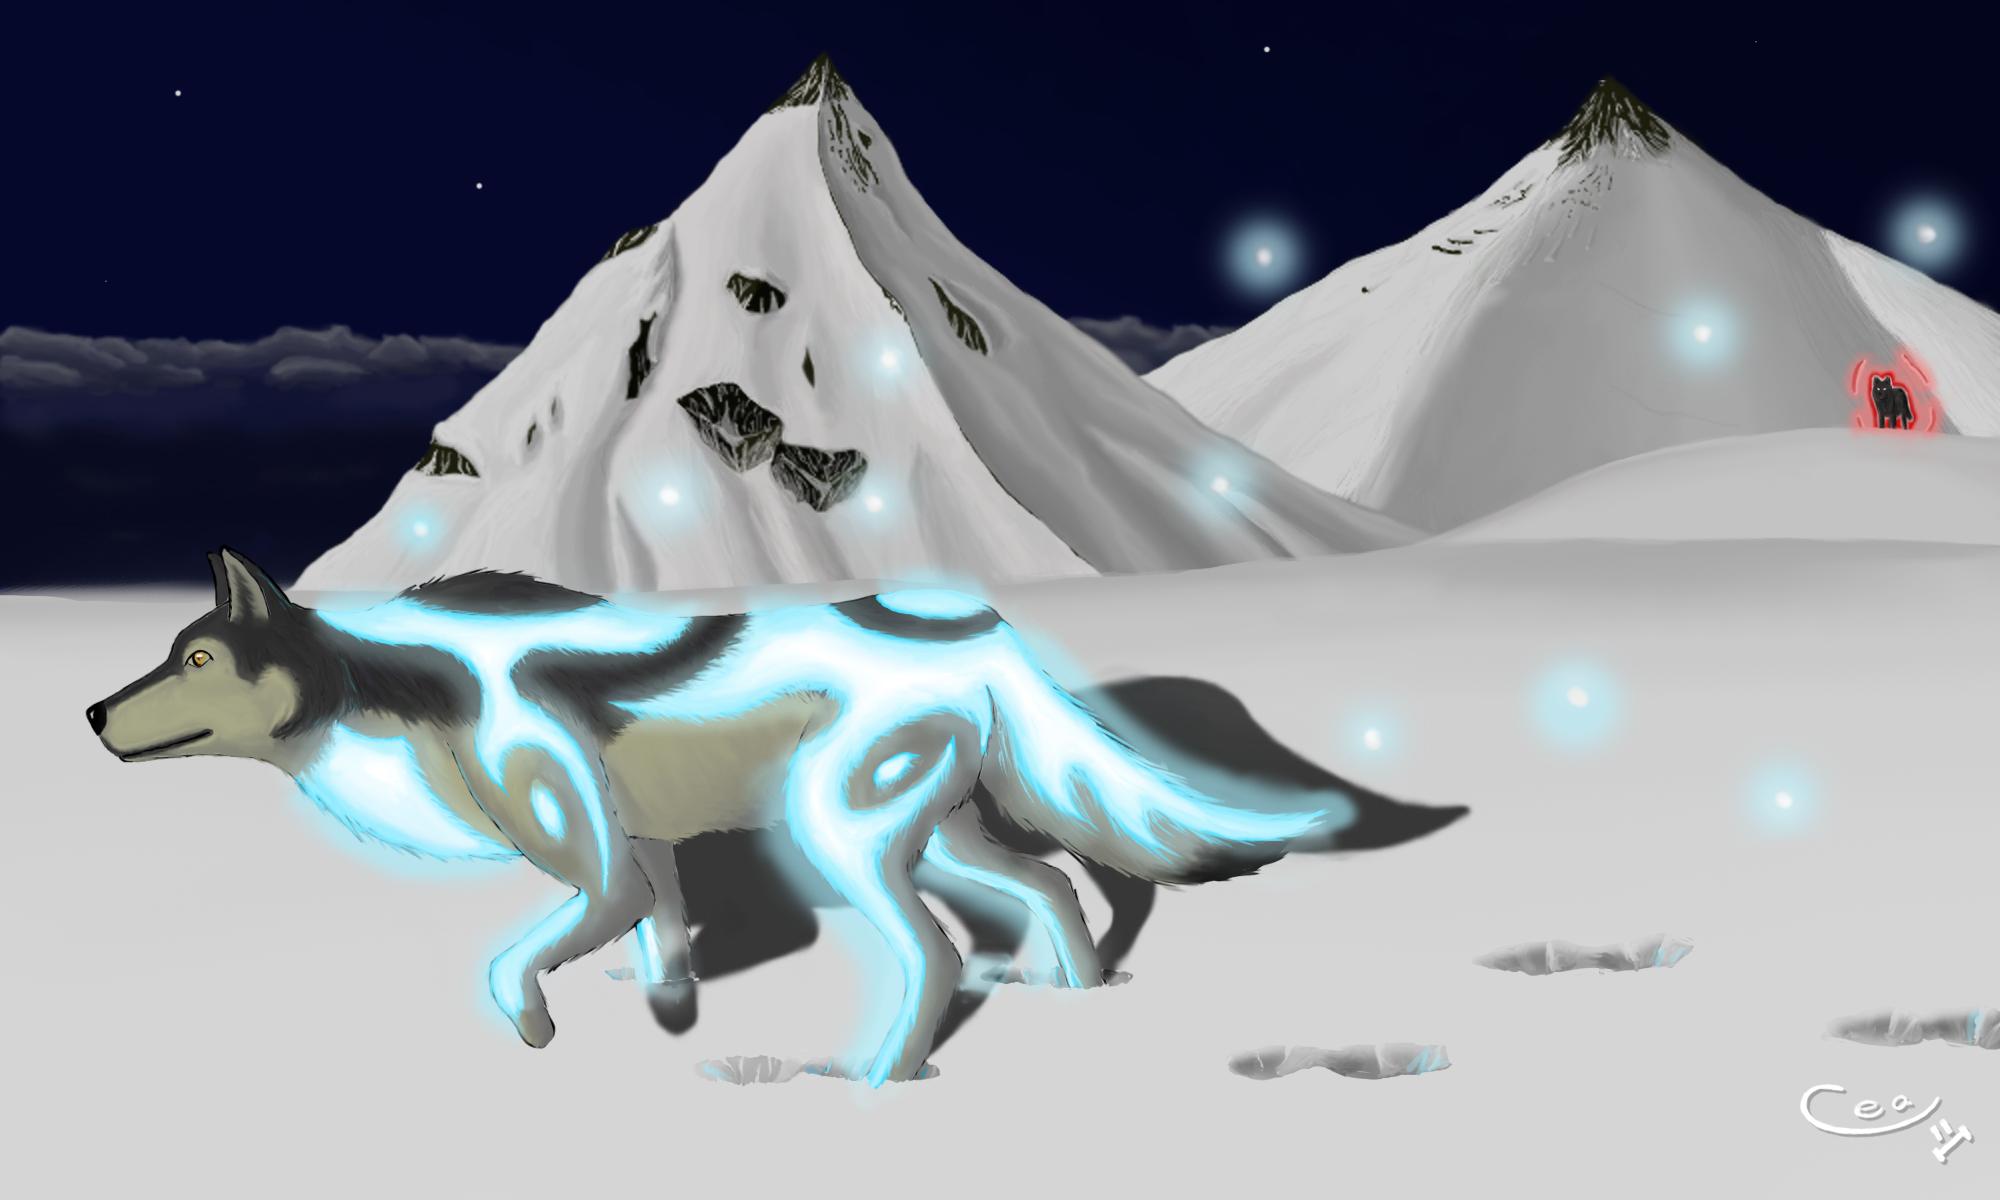 Tema general de dibujo. Magic_wolf_by_dekeam-d7b9u51